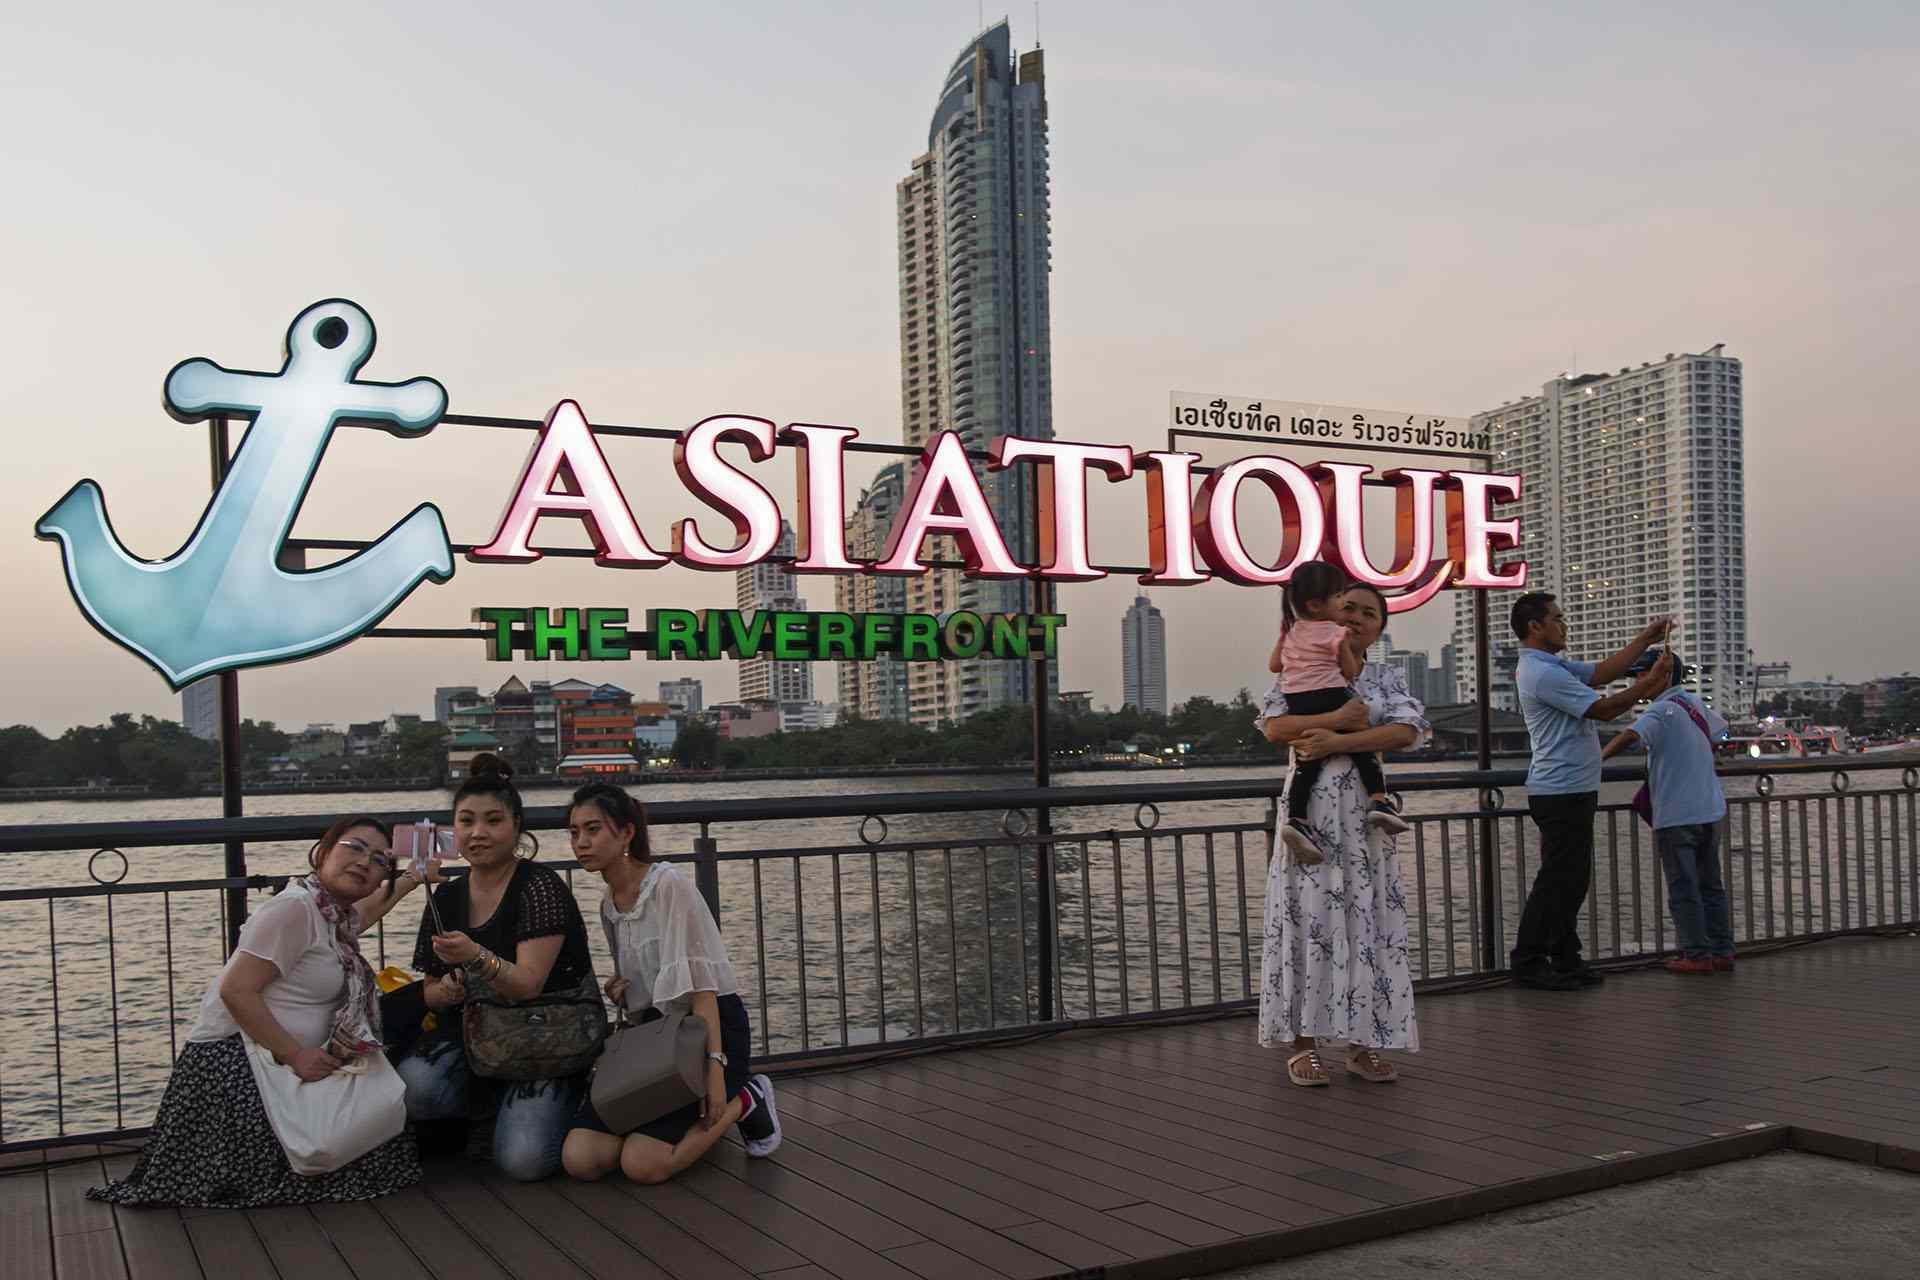 Asiatique waterfront